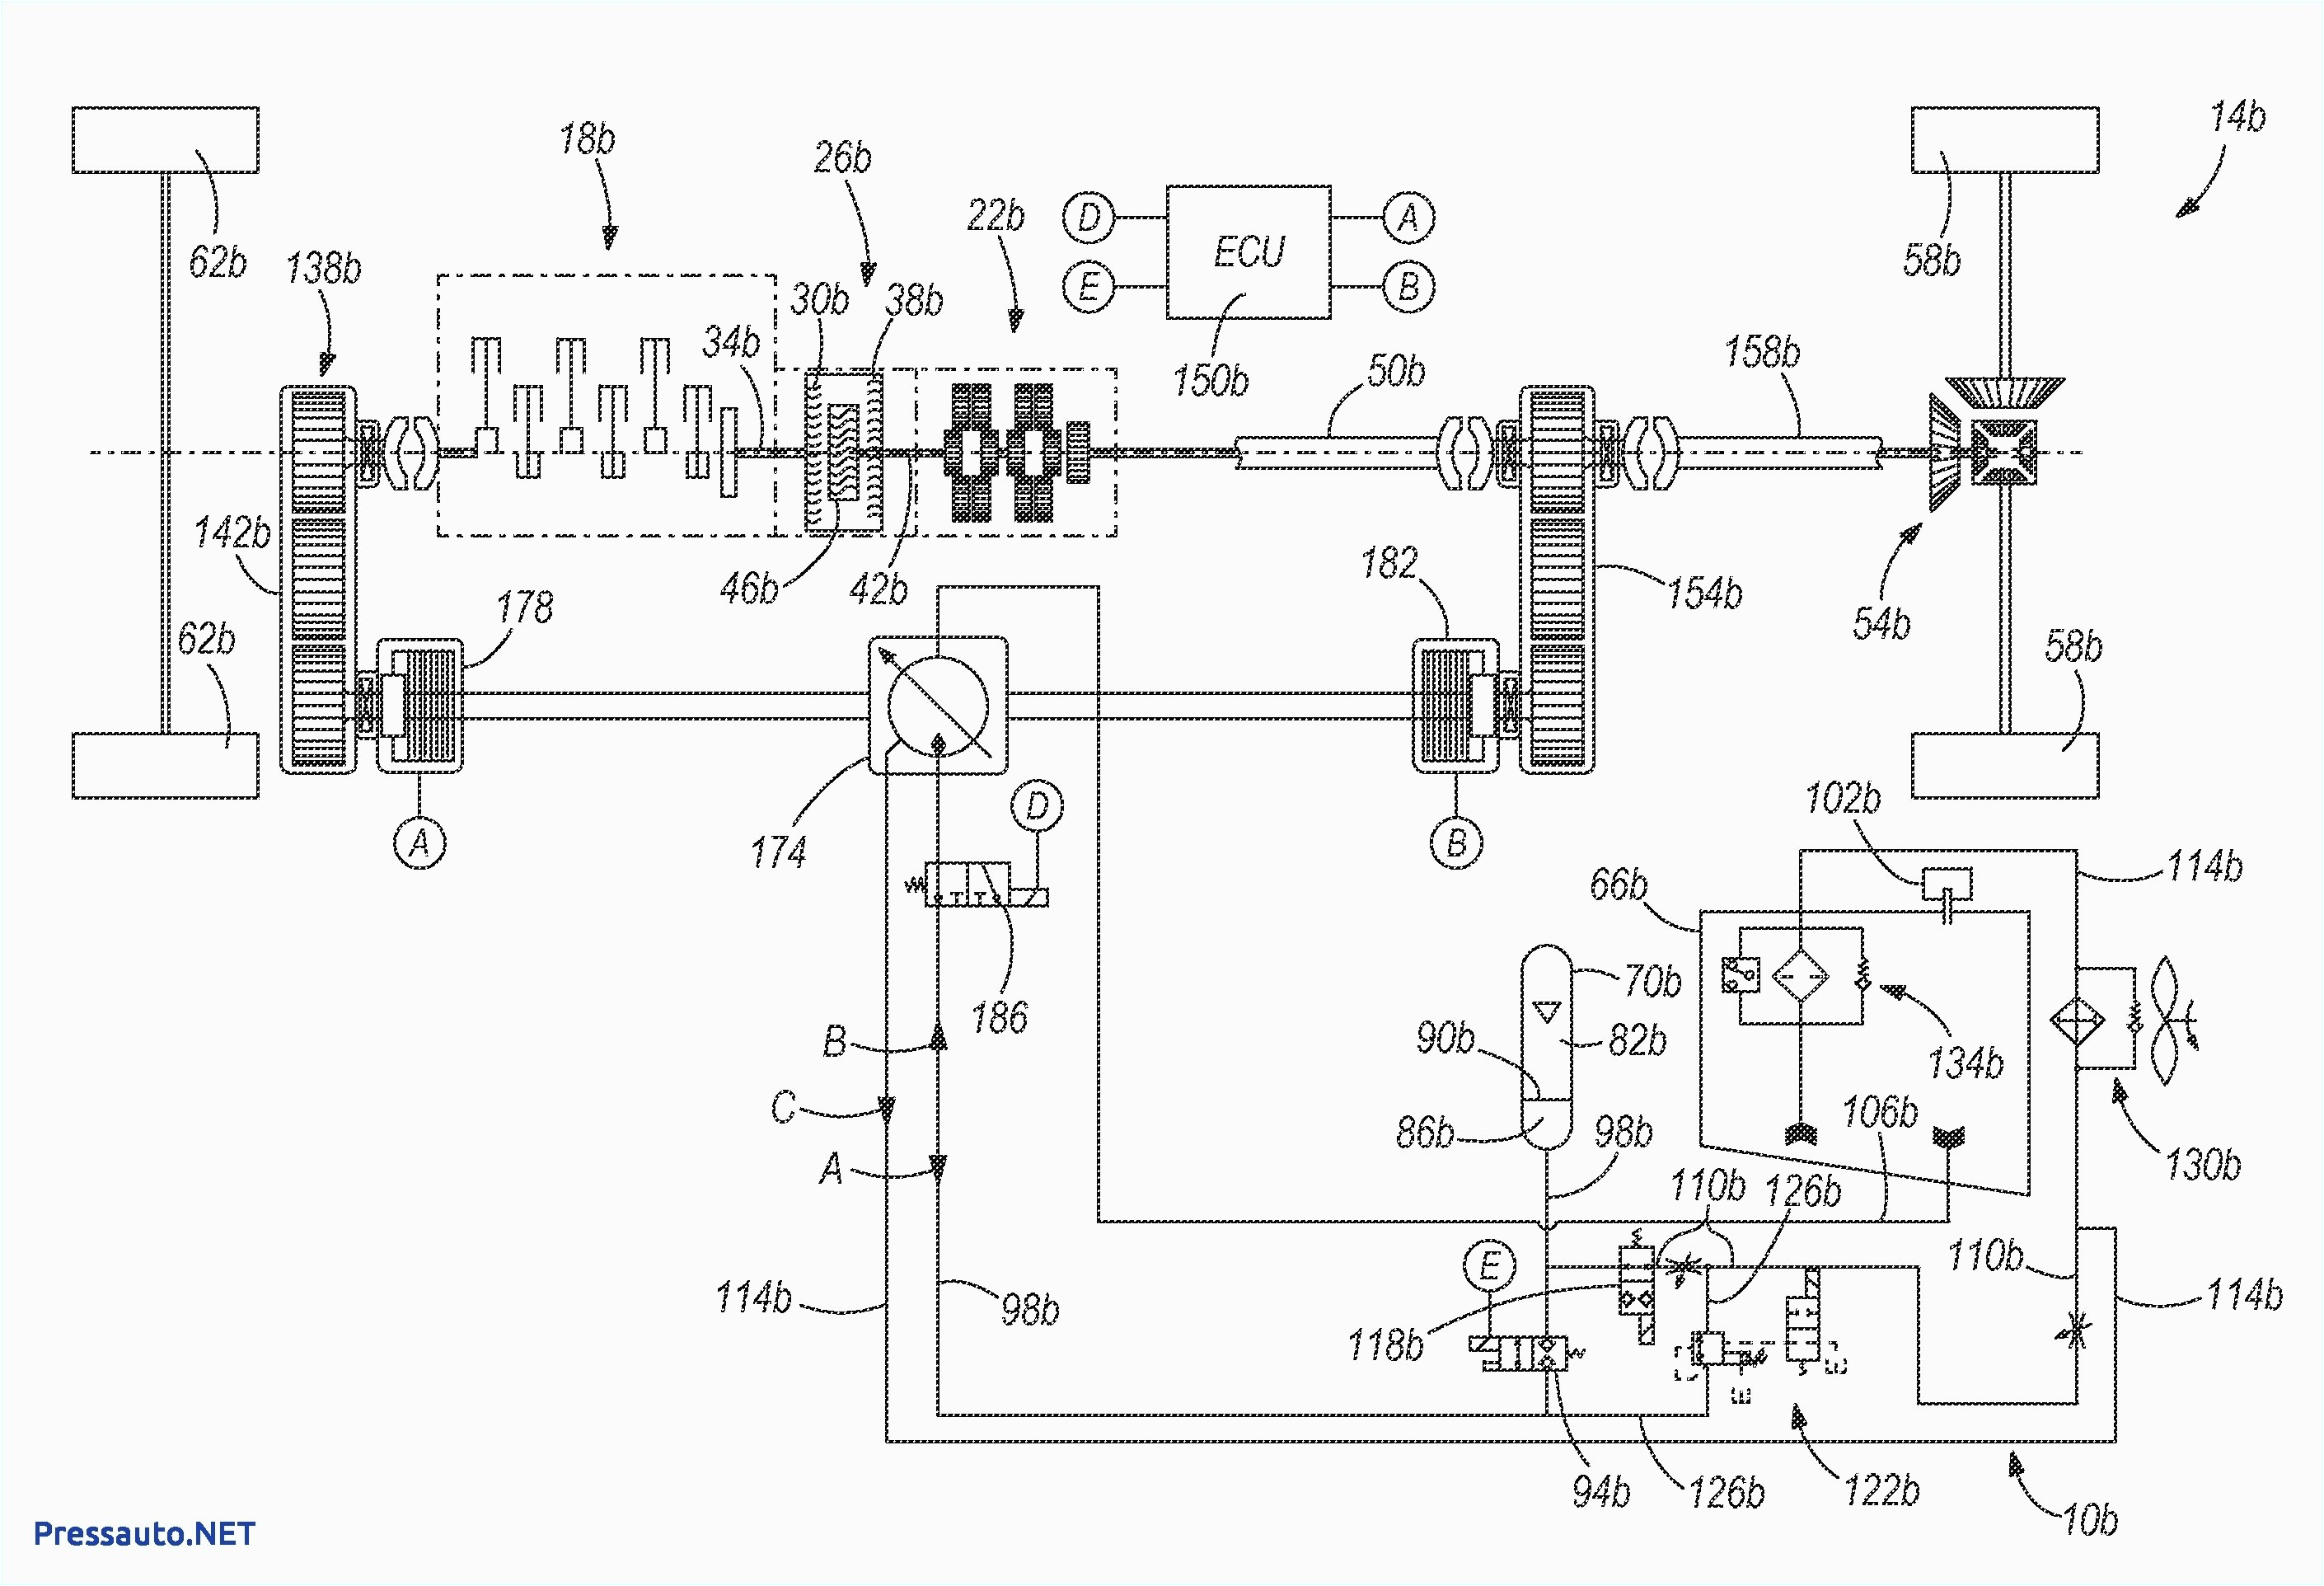 2002 international 4300 wiring diagram new international 4900 wiring diagram image of 2002 international 4300 wiring diagram jpg